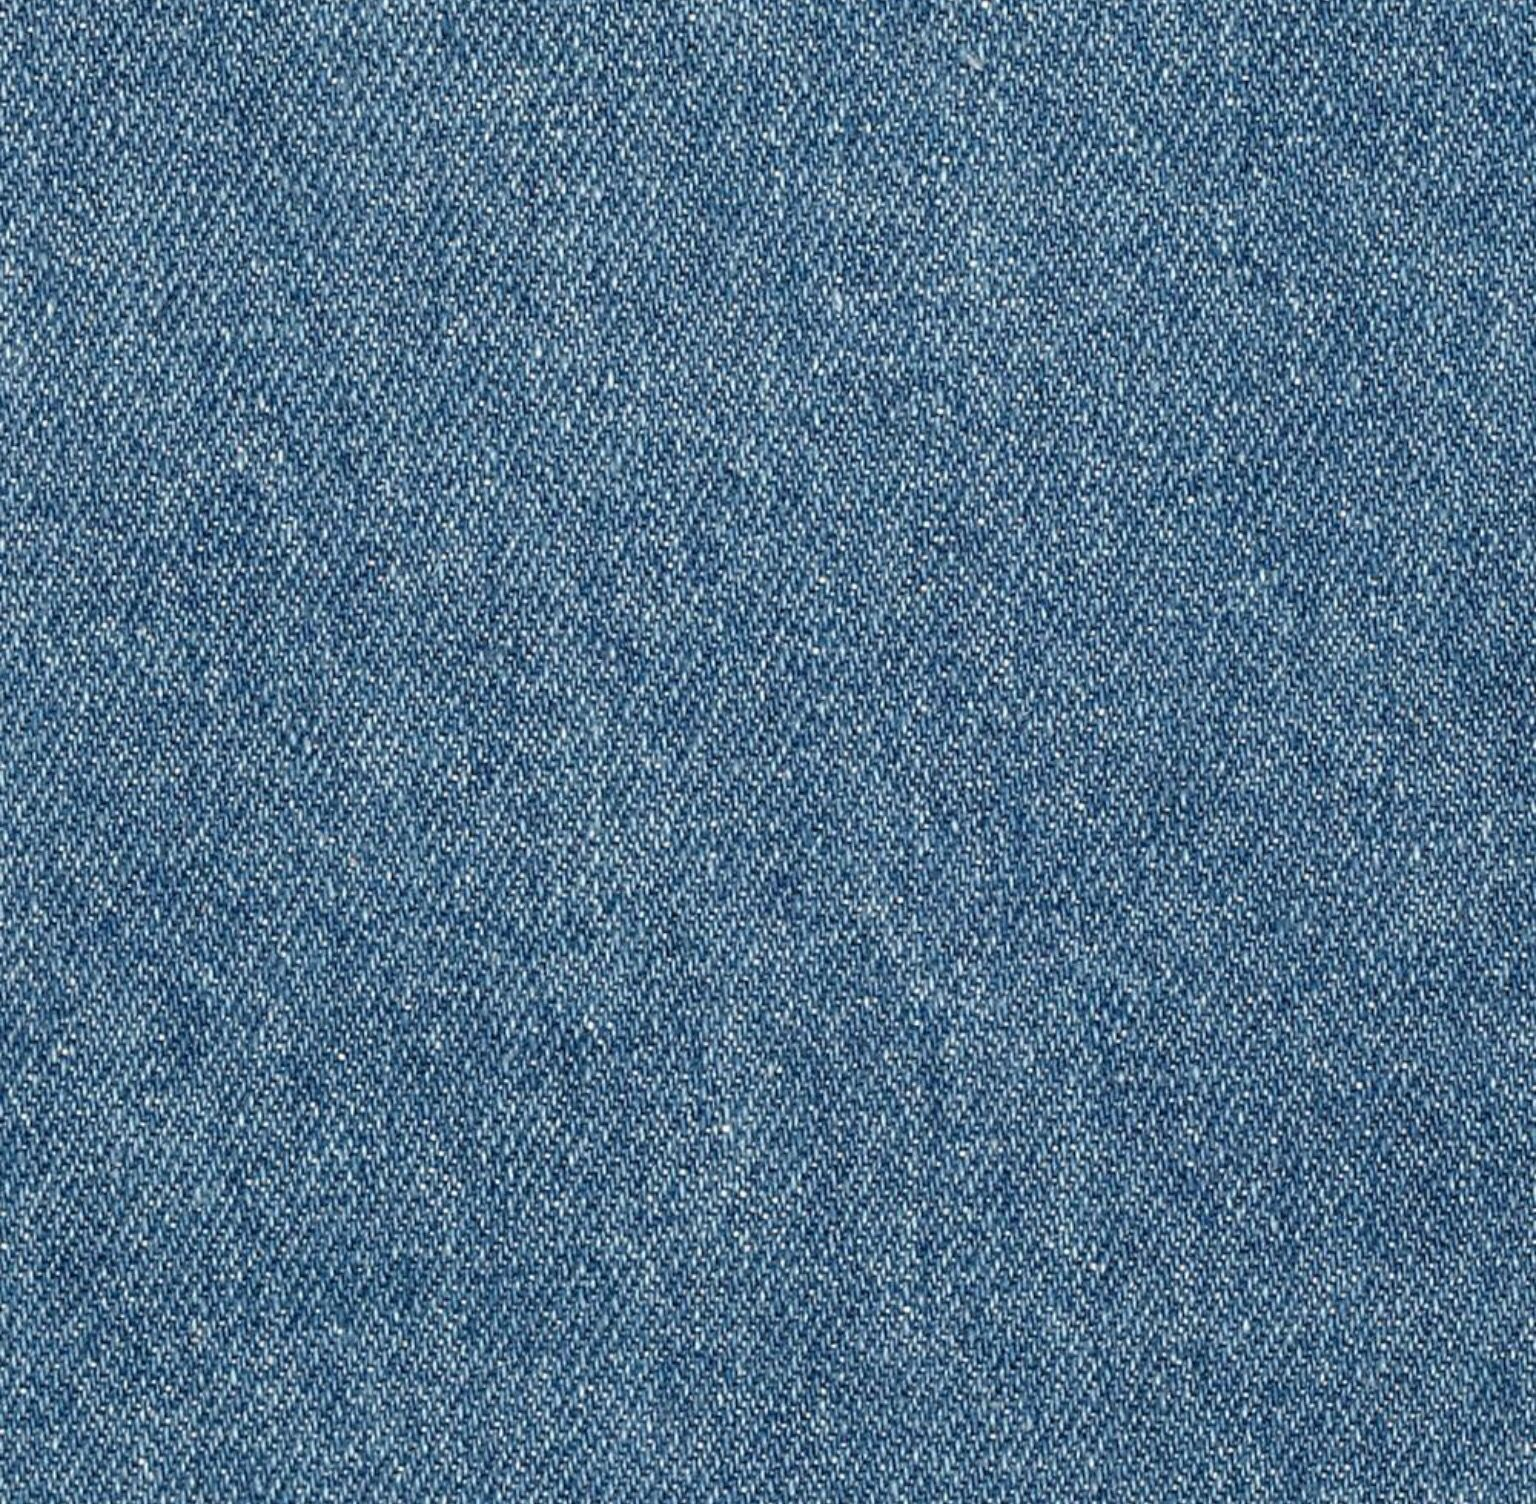 Denim swatch denim pinterest swatch denim skirt and for Denim fabric